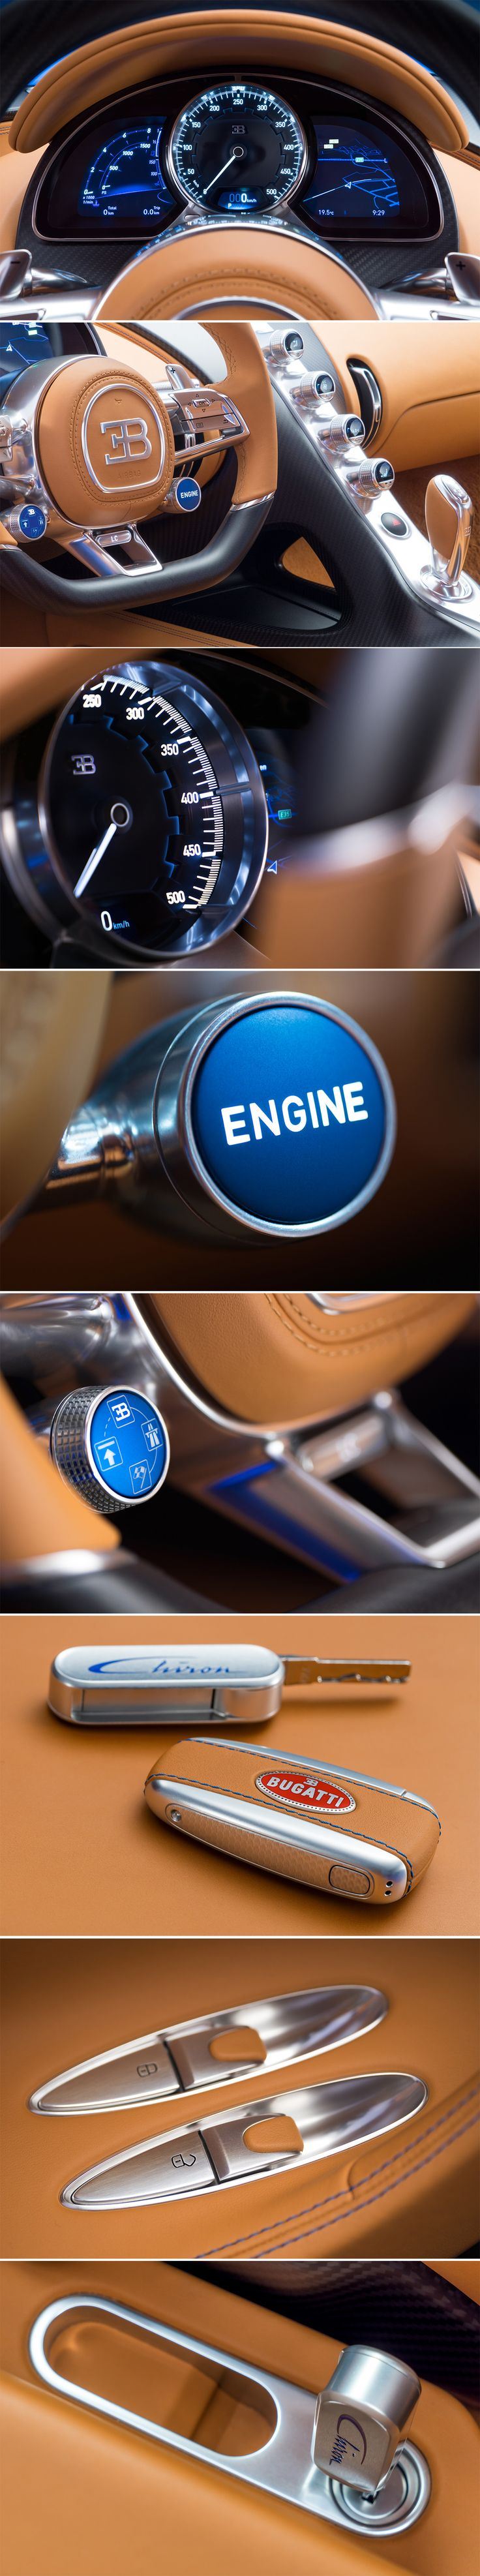 Bugatti Chiron, Interior Details